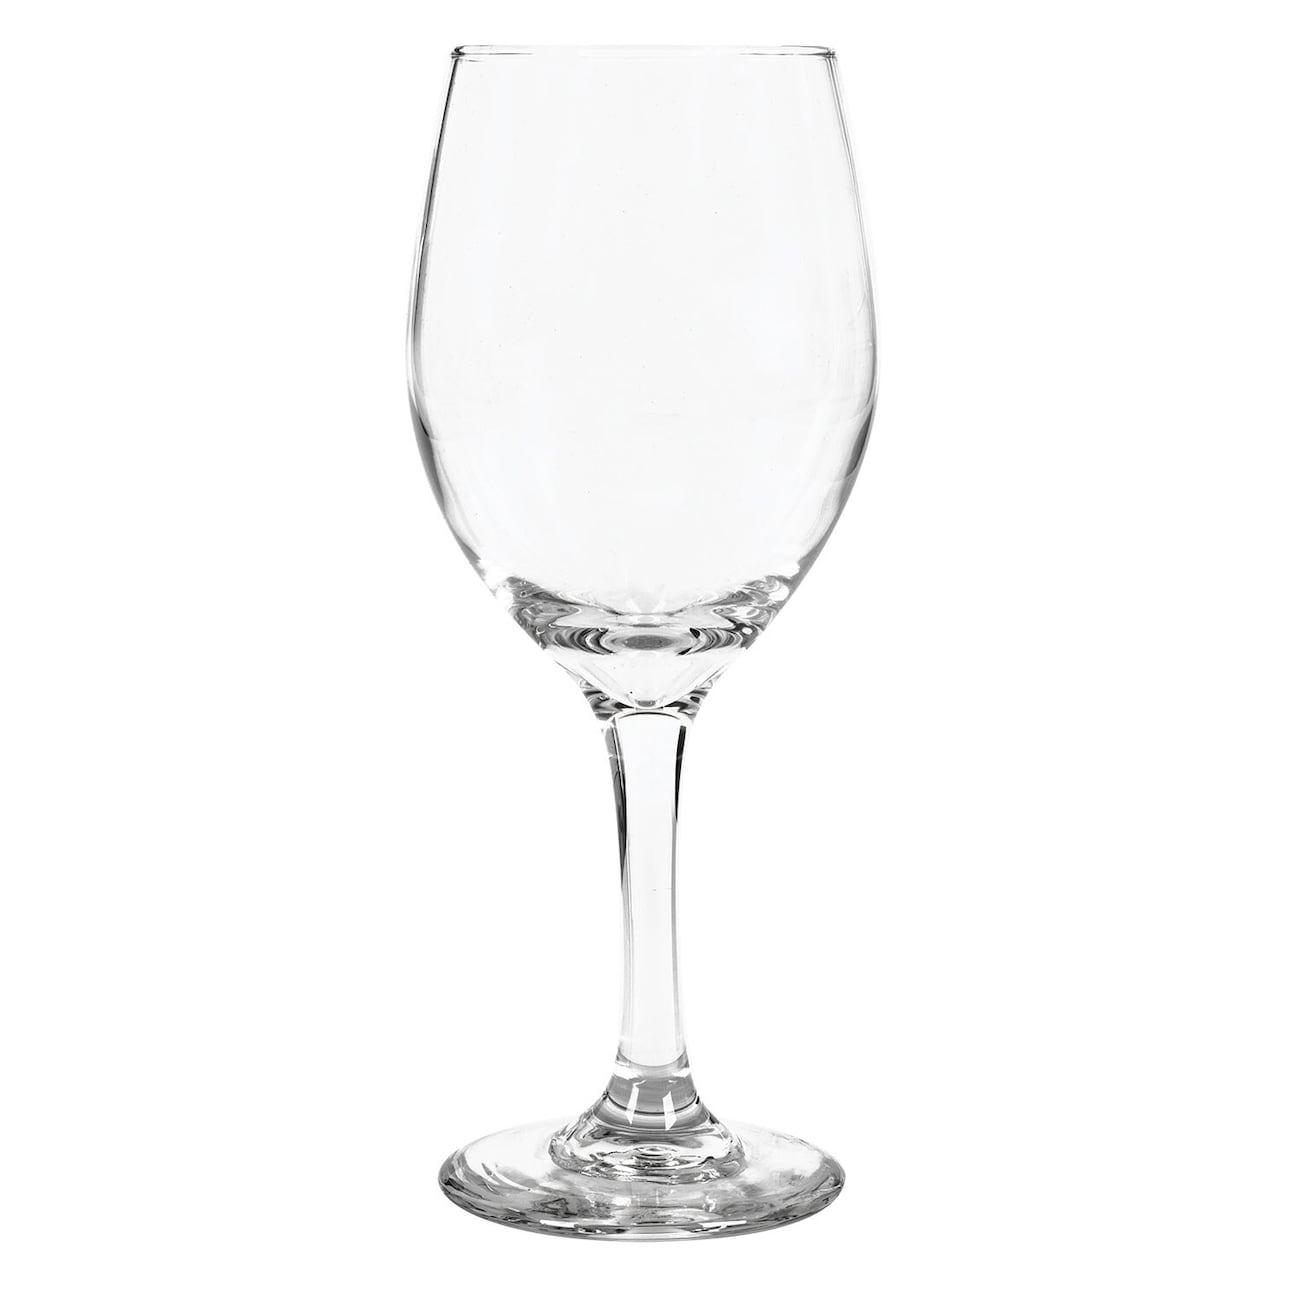 Clic Long Stem White Wine Gles 14 Oz